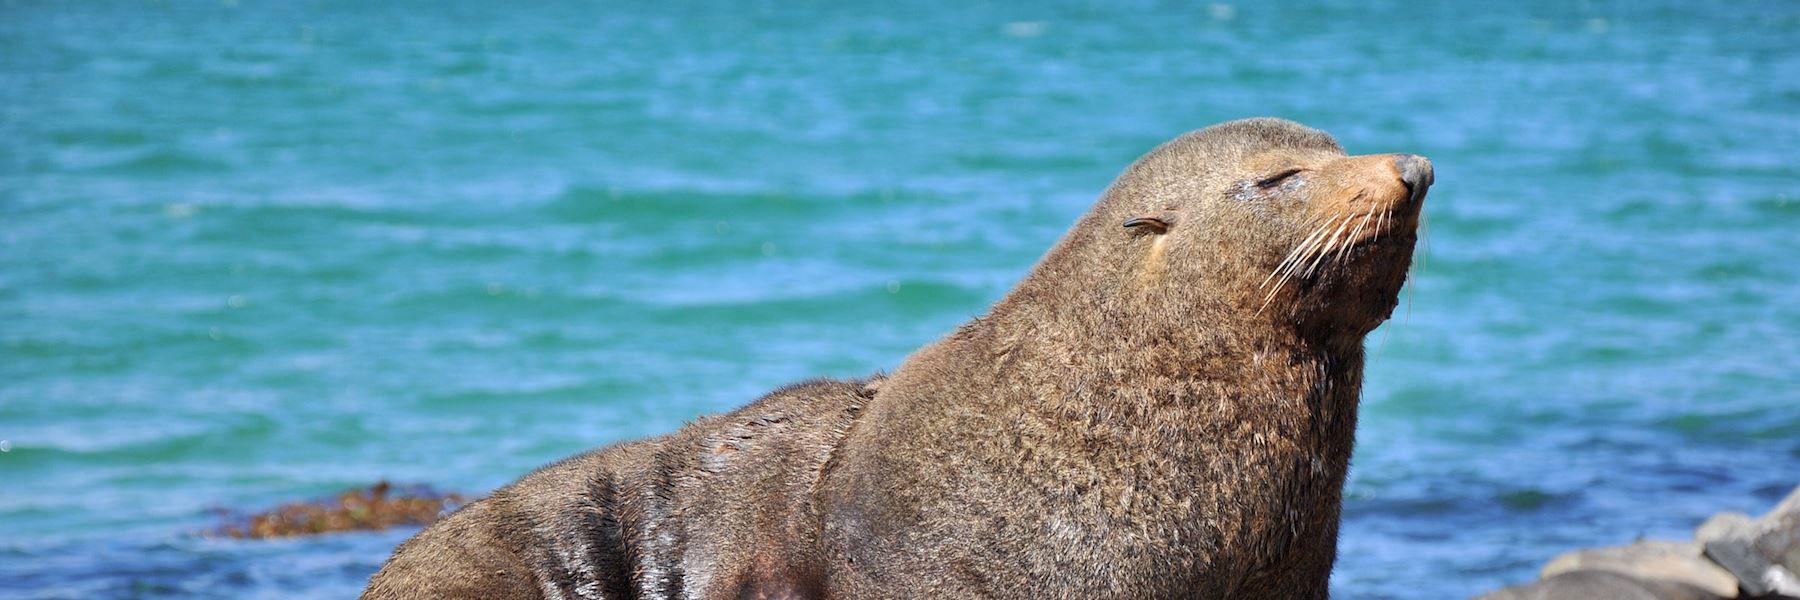 Visit the Otago Peninsula, New Zealand